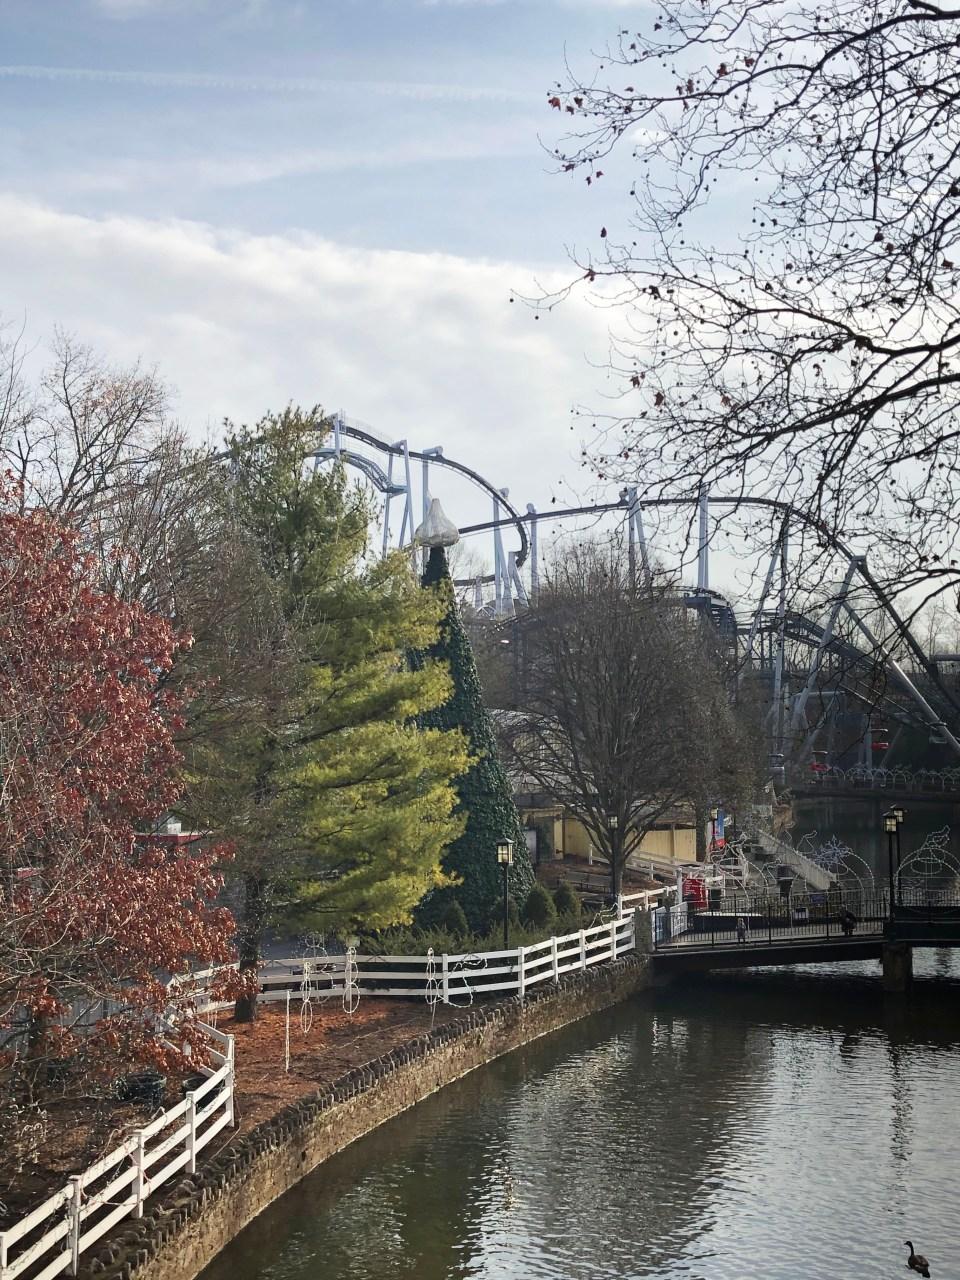 Hershey Park 3